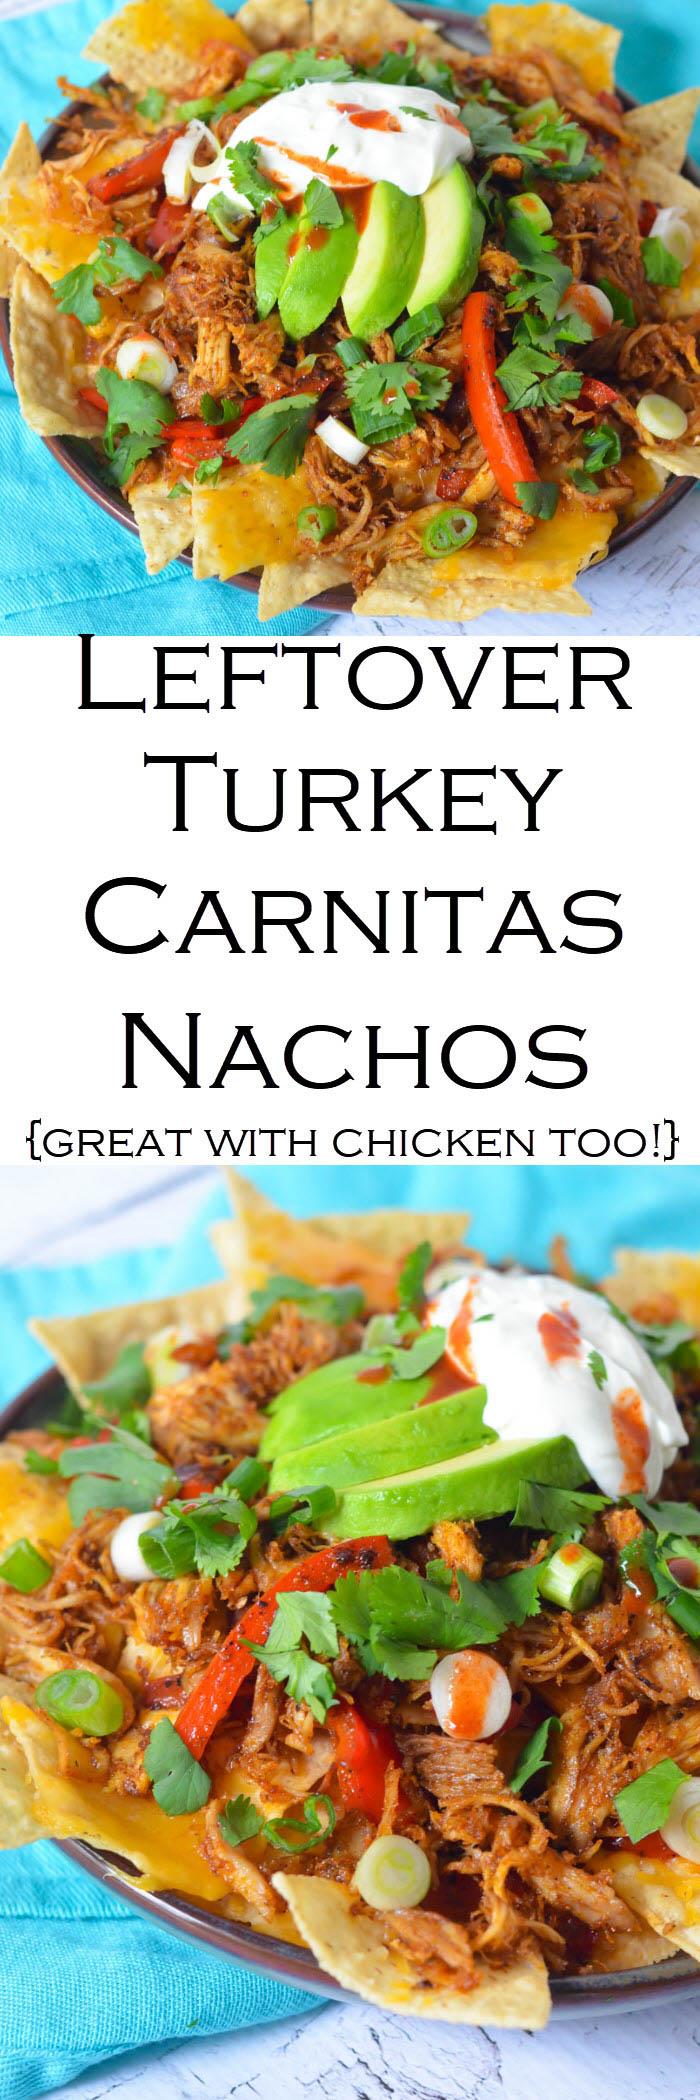 Leftover Turkey Carnitas Recipe #LMrecipes #turkey #carnitas #thanksgiving #thanksgivingleftovers #mexicanfood #foodblog #foodblogger